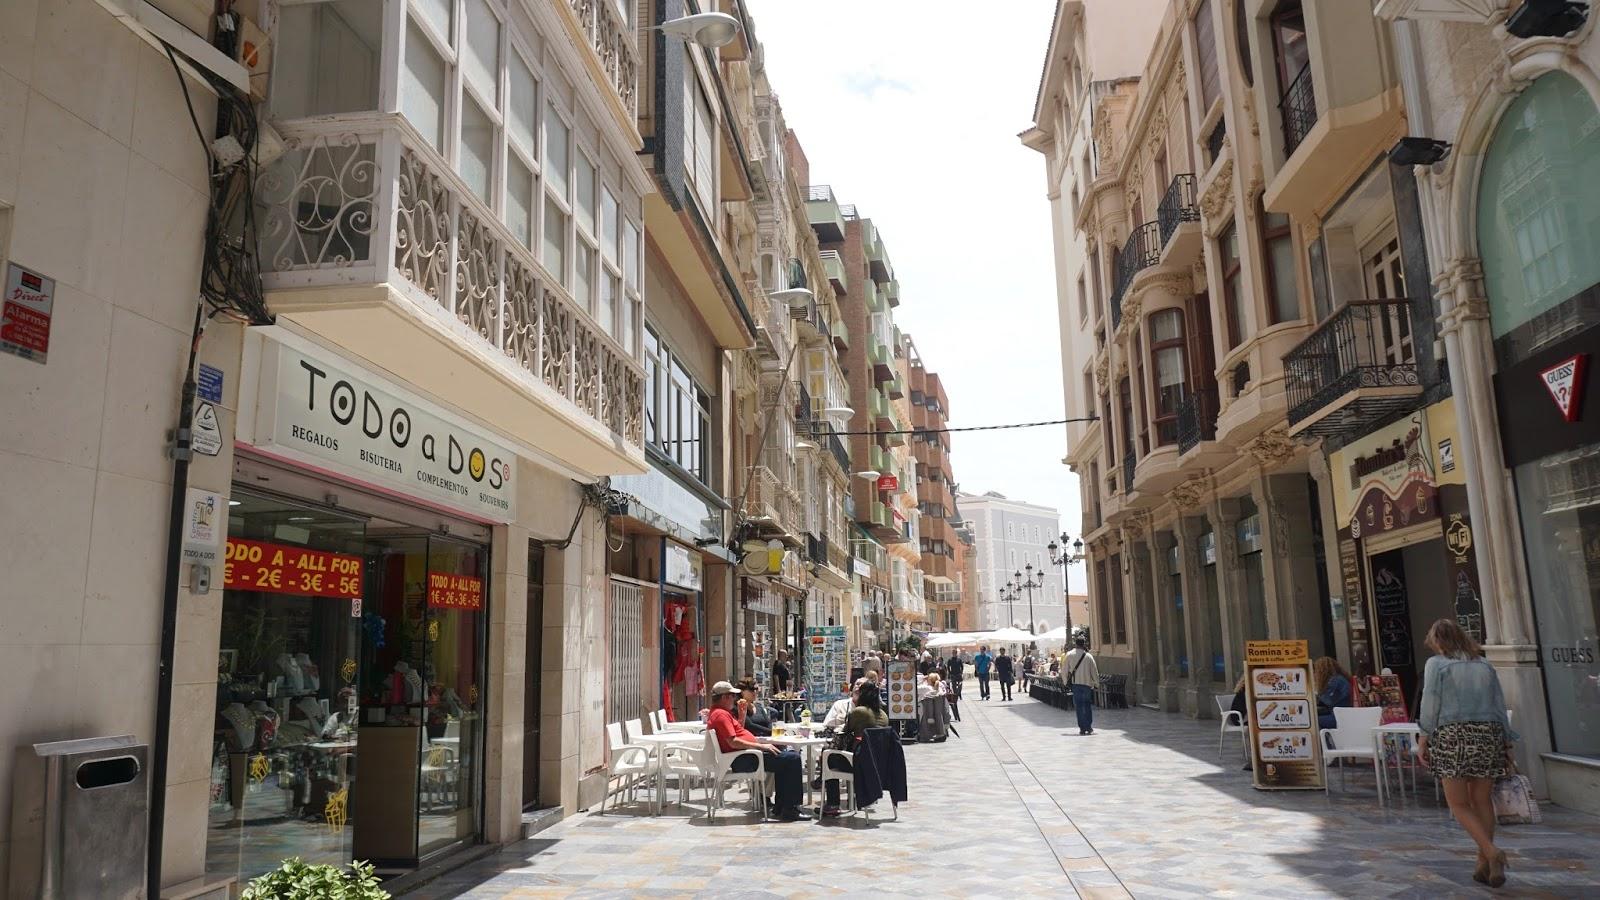 kartageński deptak, Alicante, atrakcje Hiszpanii, południowa Hiszpania, Pani Dorcia, Pani Dorcia blog, blog o podróżach, prowincja Murcja,  Costa Calida